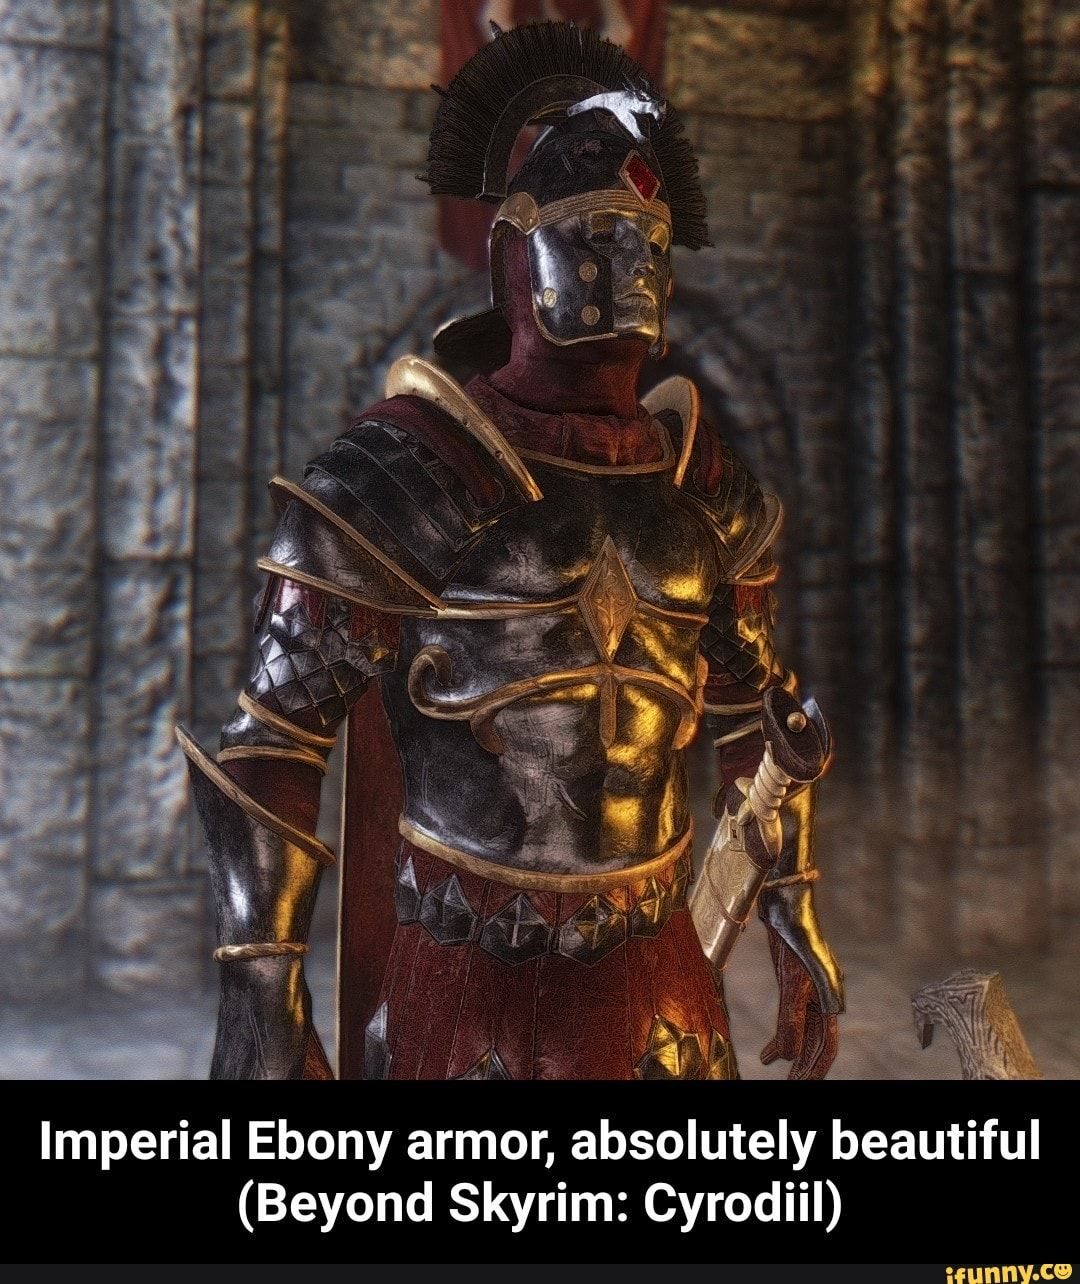 Imperial Ebony Armor Absolutely Beautiful Beyond Skyrim Cyrodiil Imperial Ebony Armor Absolutely Beautiful Beyond Skyrim Cyrodiil Skyrim Imperial Skyrim Elder Scrolls Memes